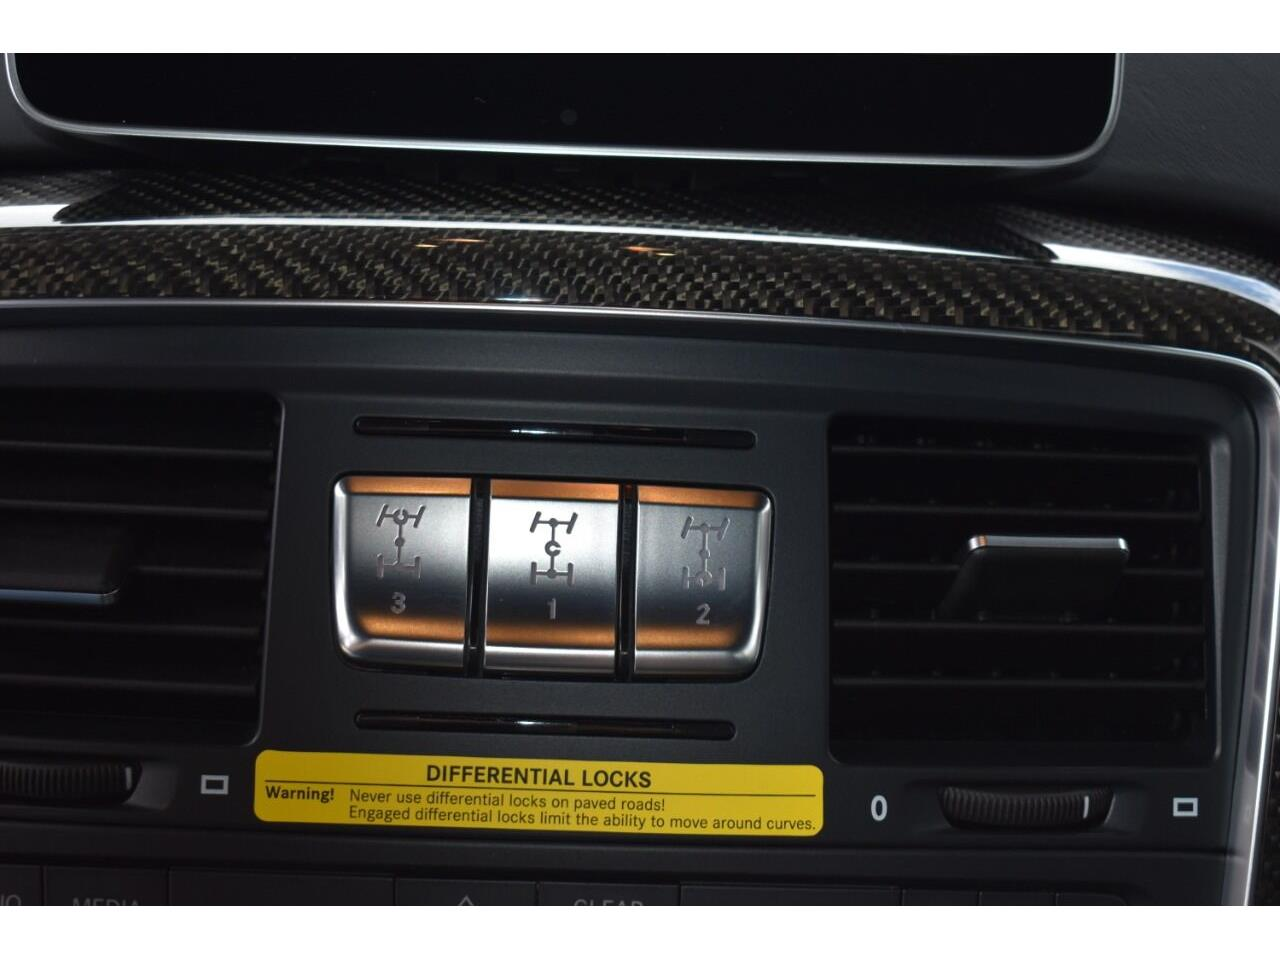 2017 Mercedes-Benz G-Class (CC-1421425) for sale in Biloxi, Mississippi